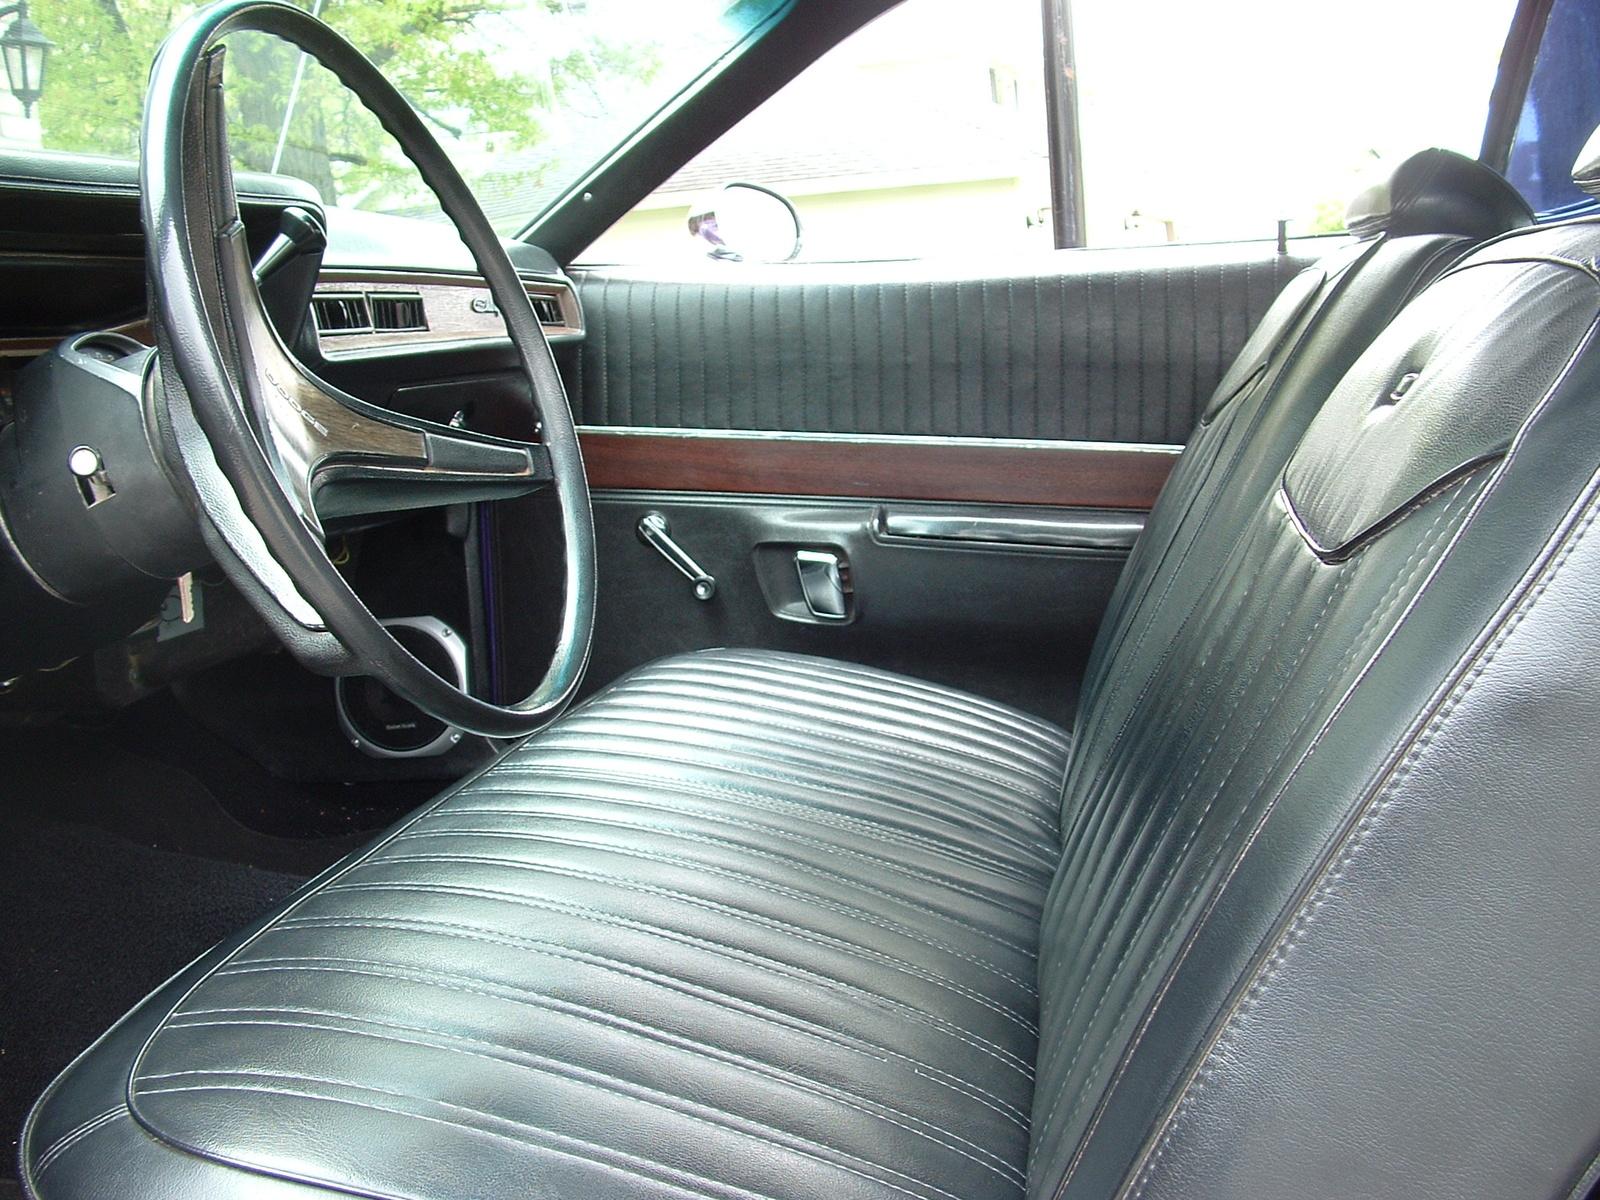 1971 Dodge Charger - Interior Pictures - CarGurus